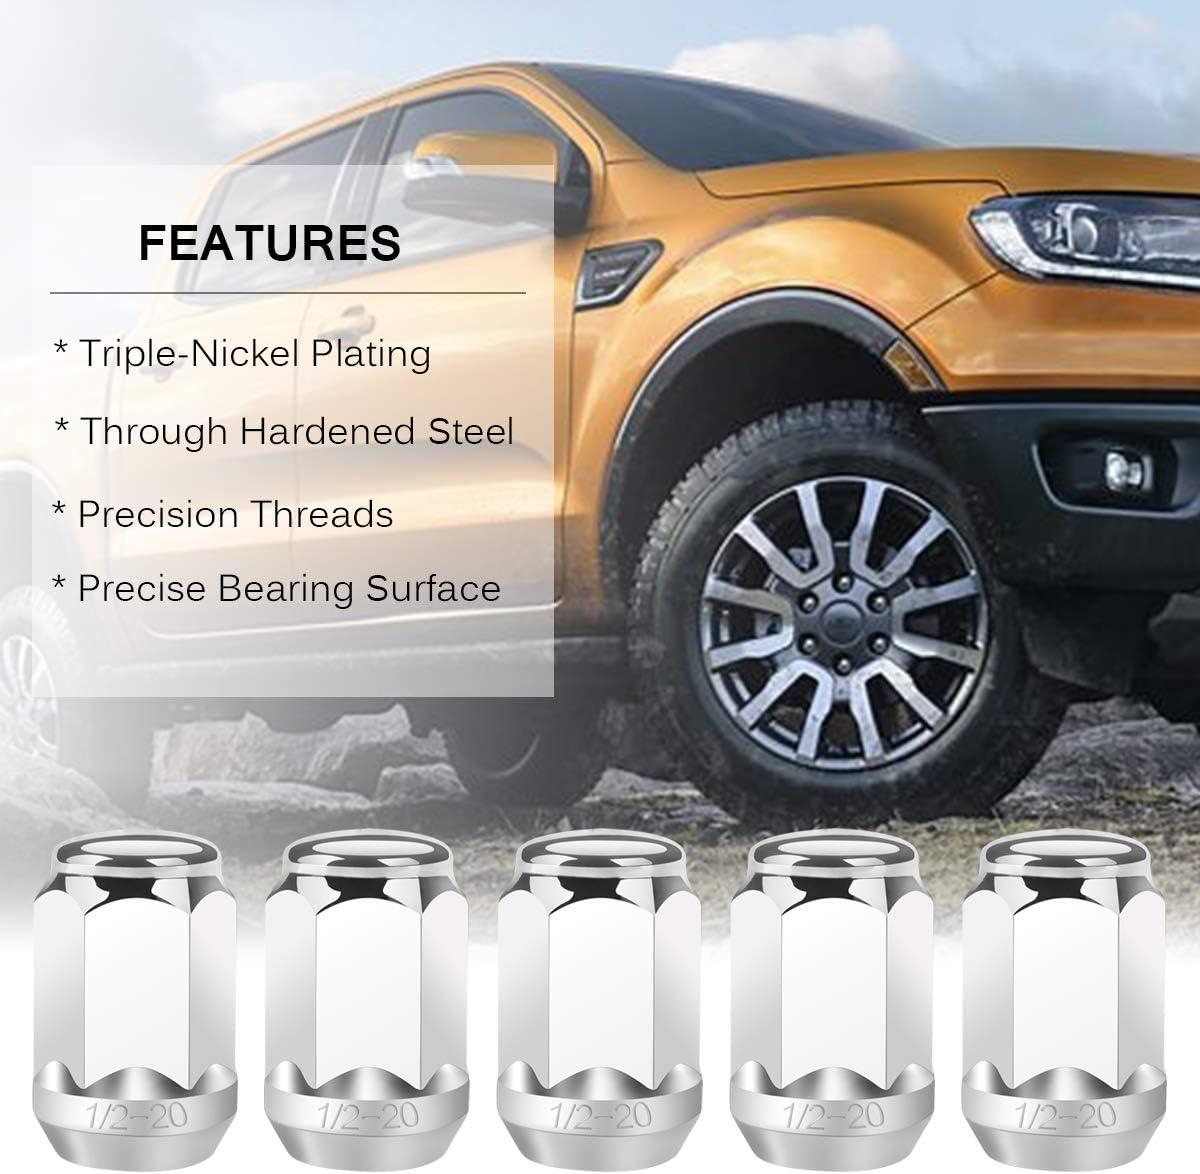 Compatible for Jeep Wrangler TJ YJ CJ JK Trucks Ford Mustang Ranger Dodge Ram 20Pcs PUENGSI Wheel Lug Nuts 1//2 x 20 1.38 Tall 3//4 Hex Chrome Bulge Acorn Lug Nuts